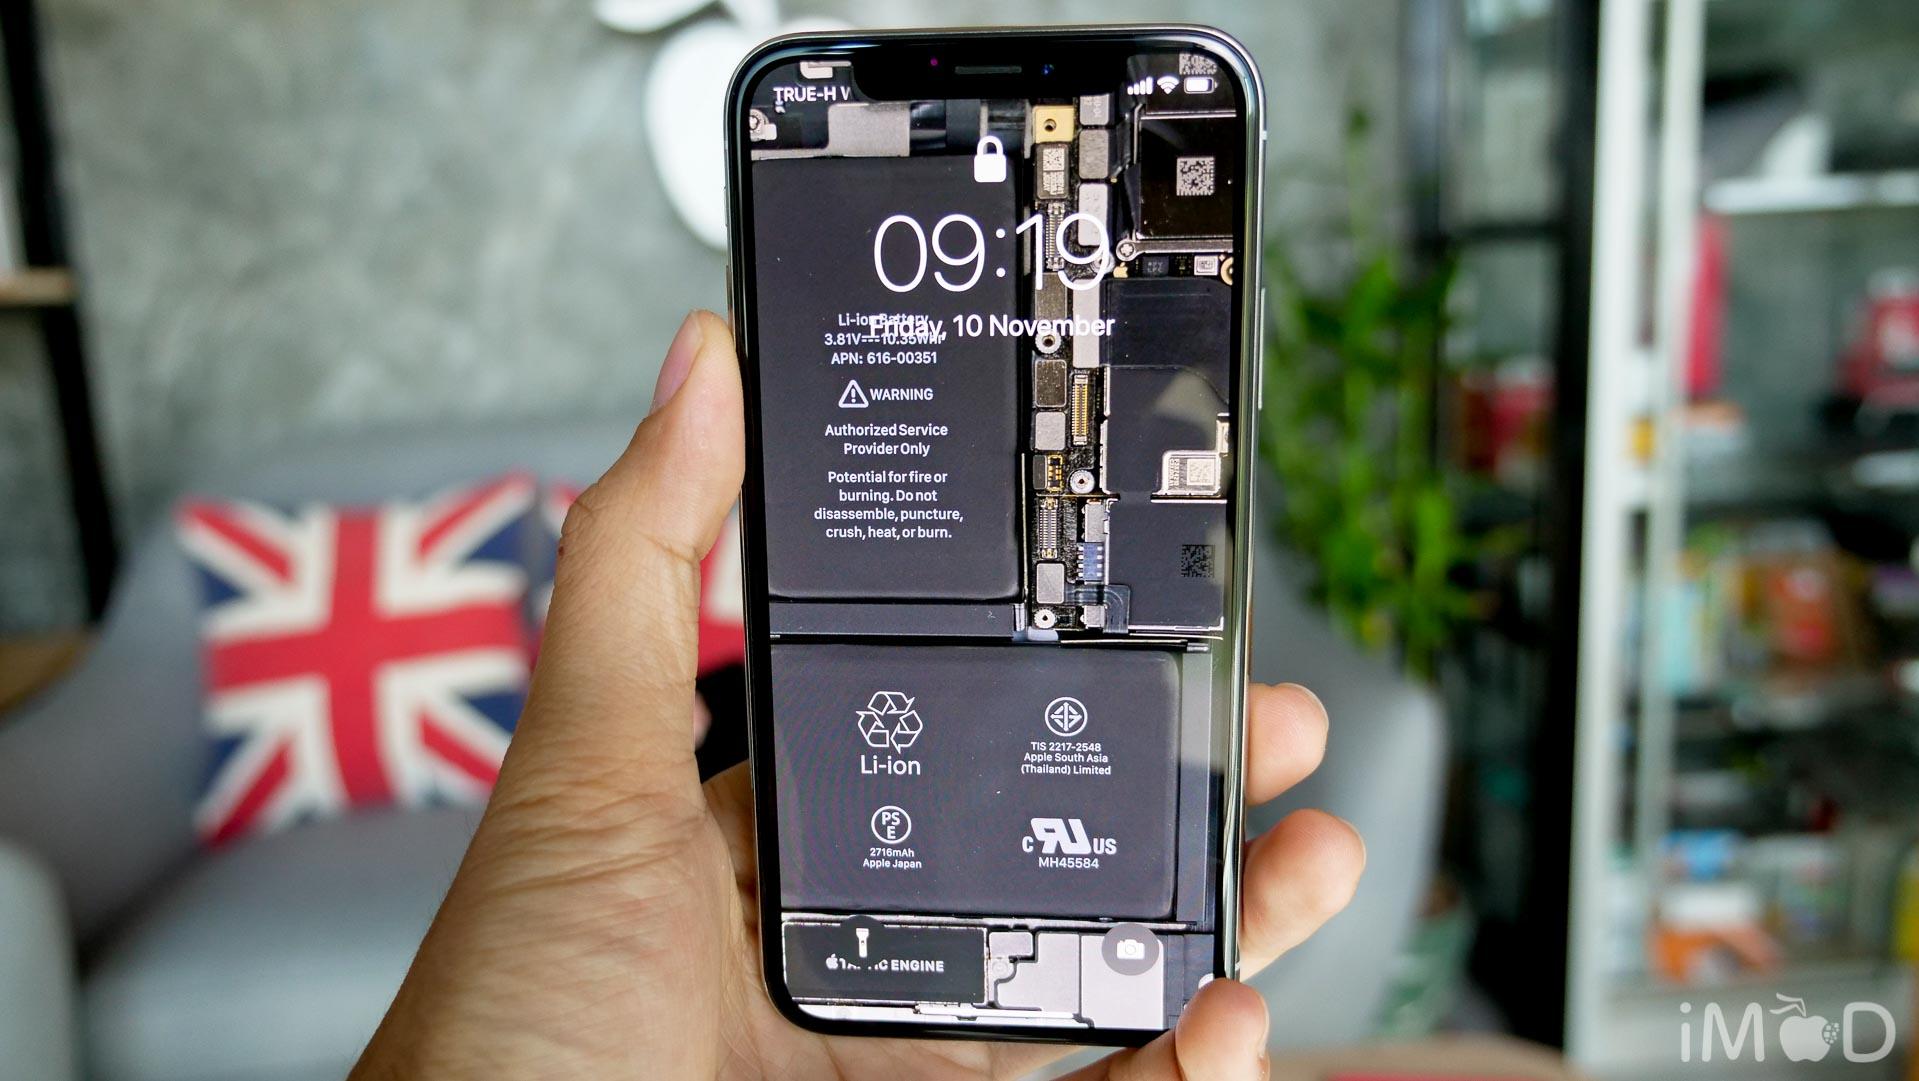 Iphone X 2018 Wallpaper ดาวน์โหลดภาพพื้นหลังวงจรภายในของ Iphone X 7 6 และรุ่นอื่นๆ